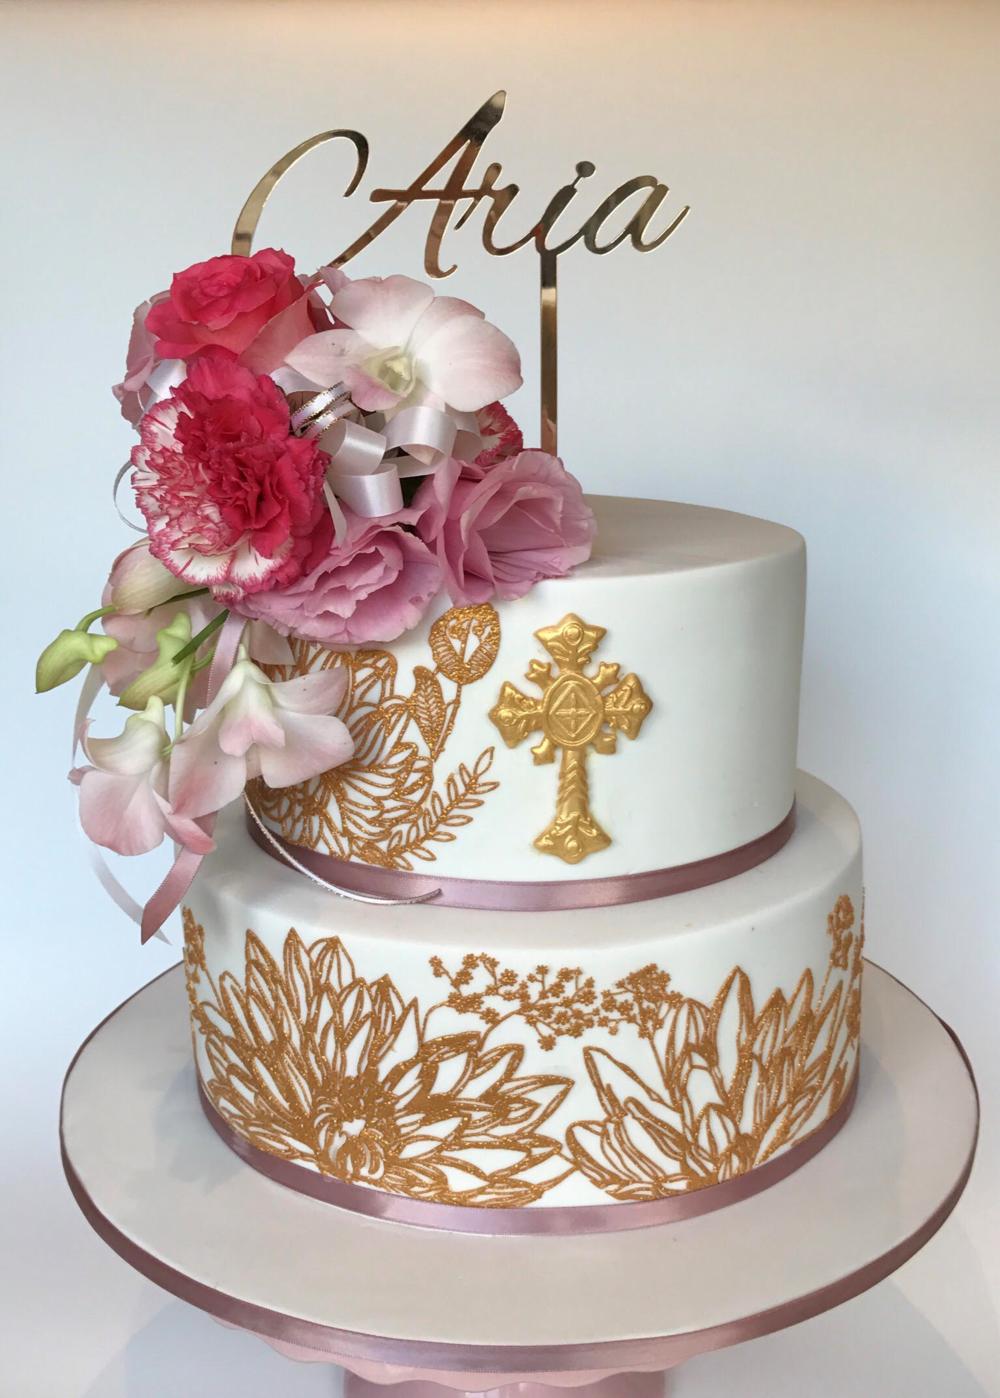 Aria cake.png